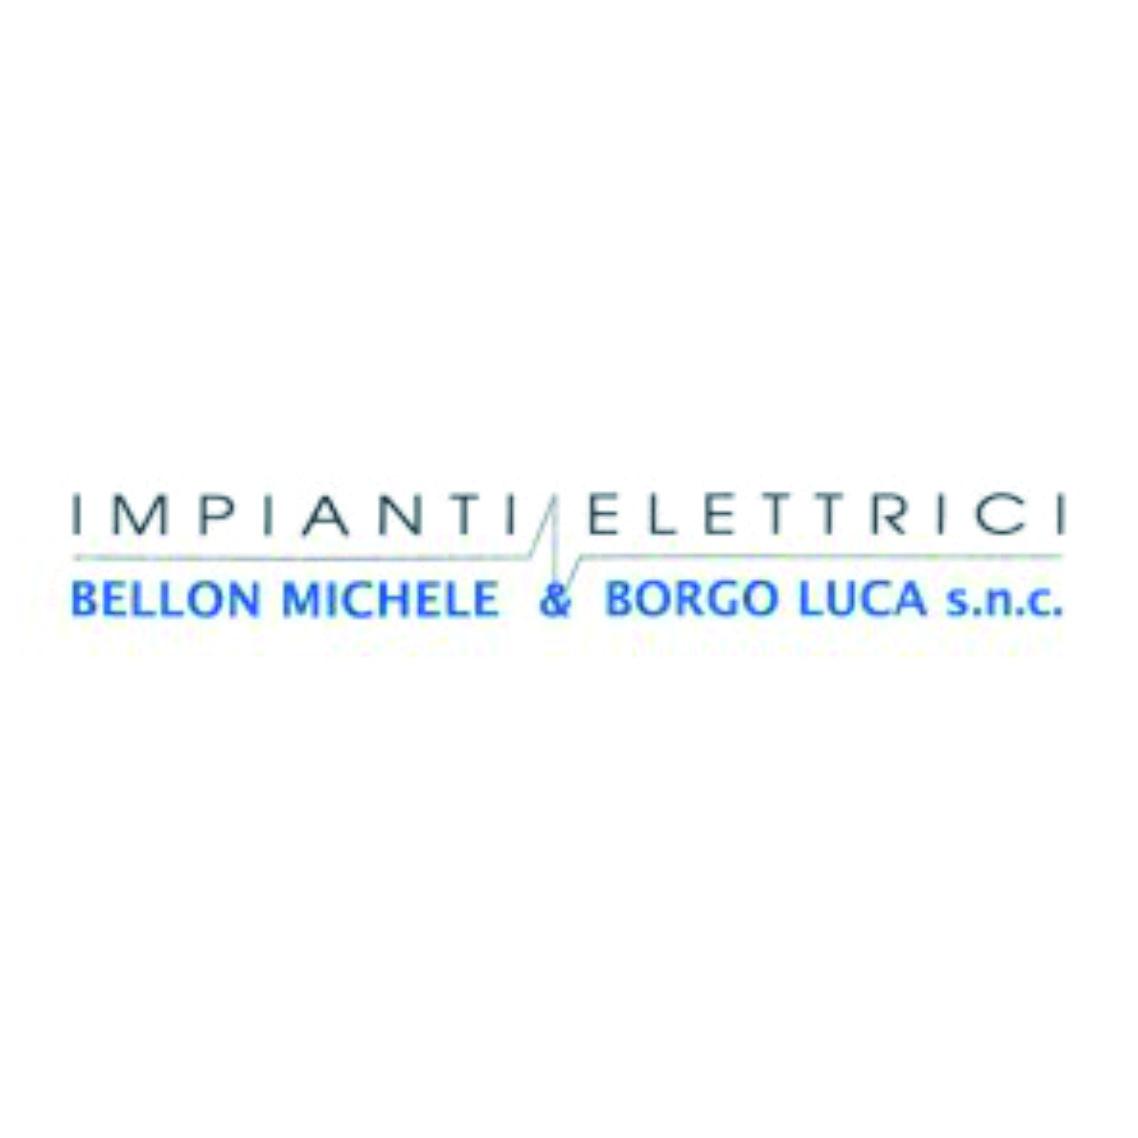 Bellon Michele & Borgo Luca